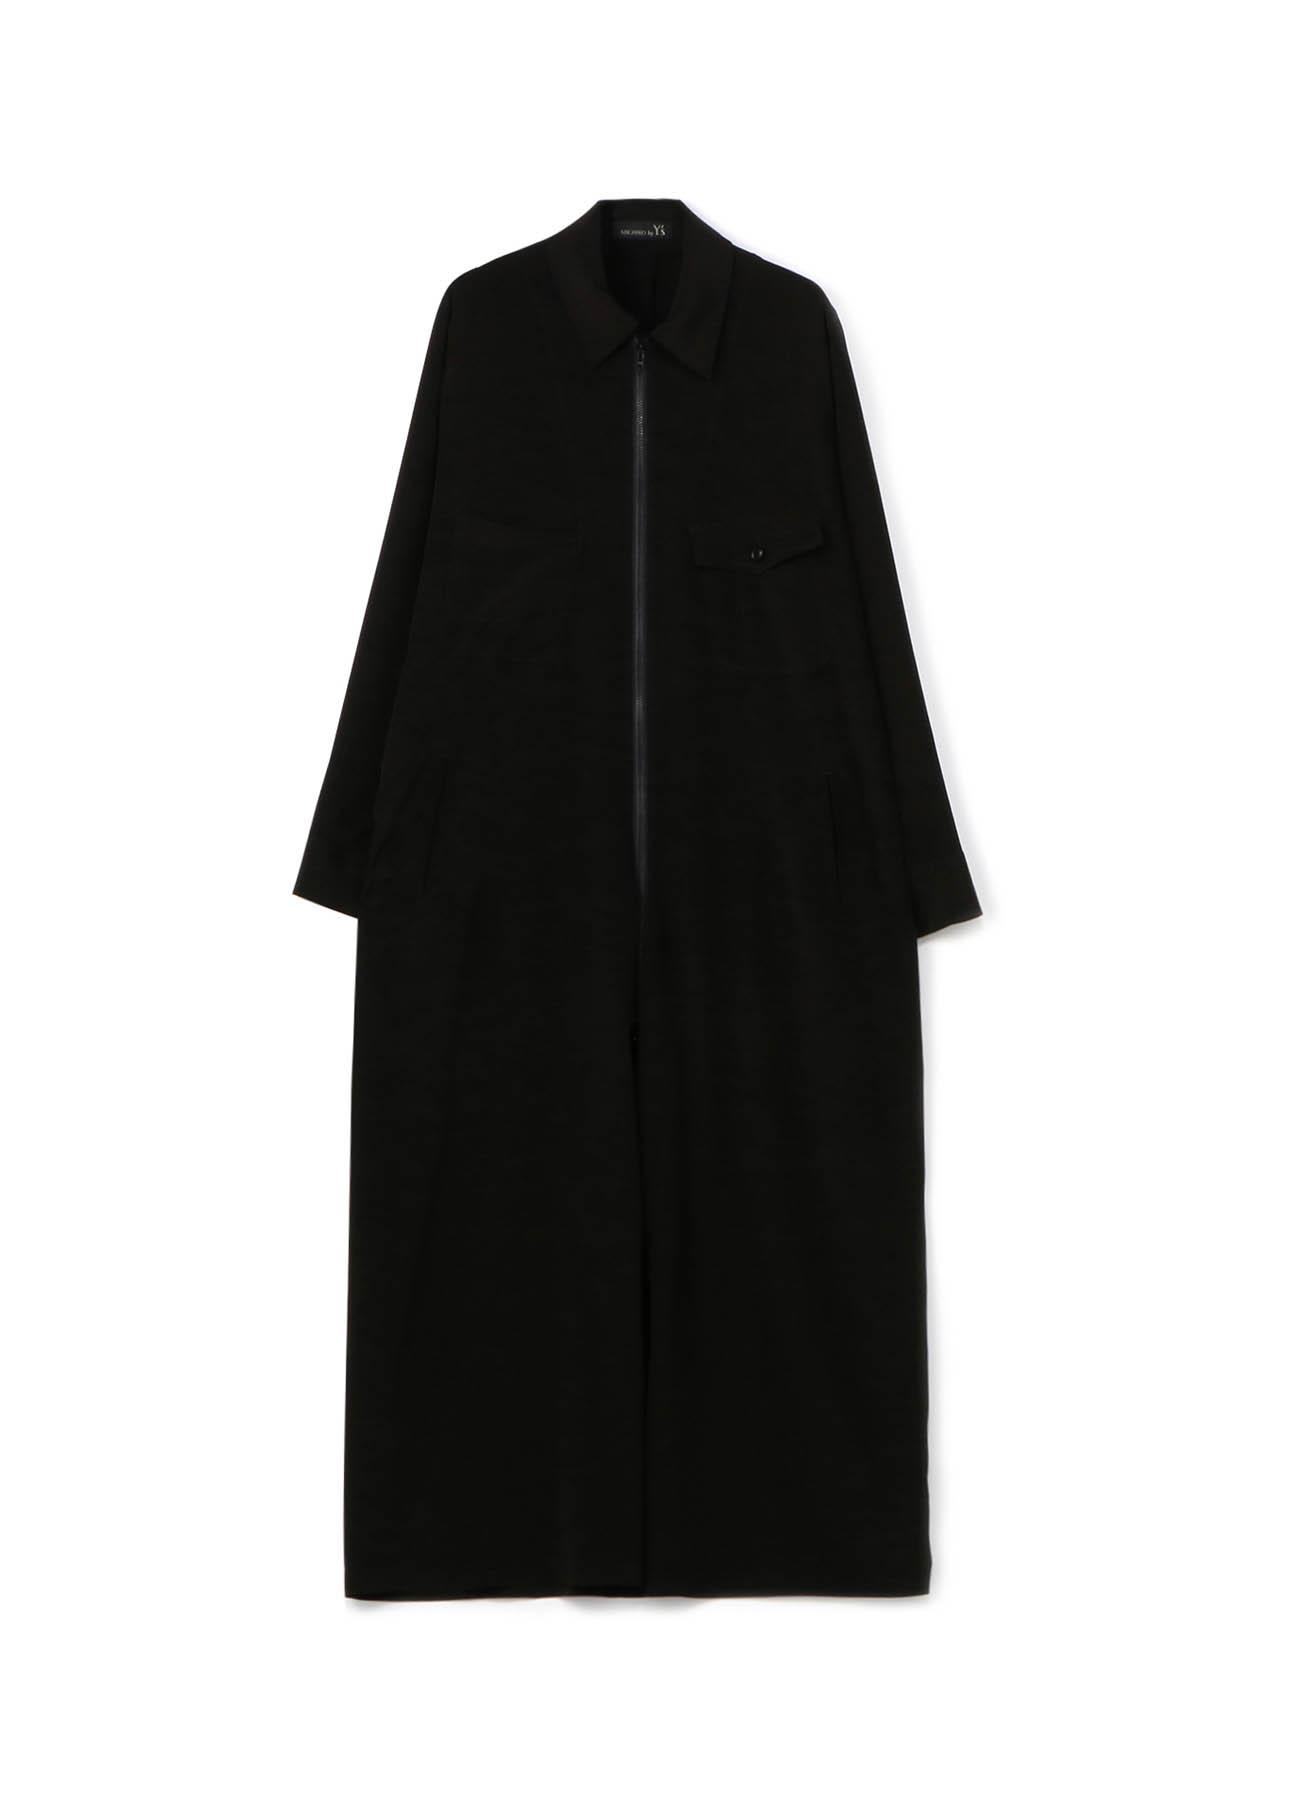 MICHIKObyY's 薄デシン つなぎドレス